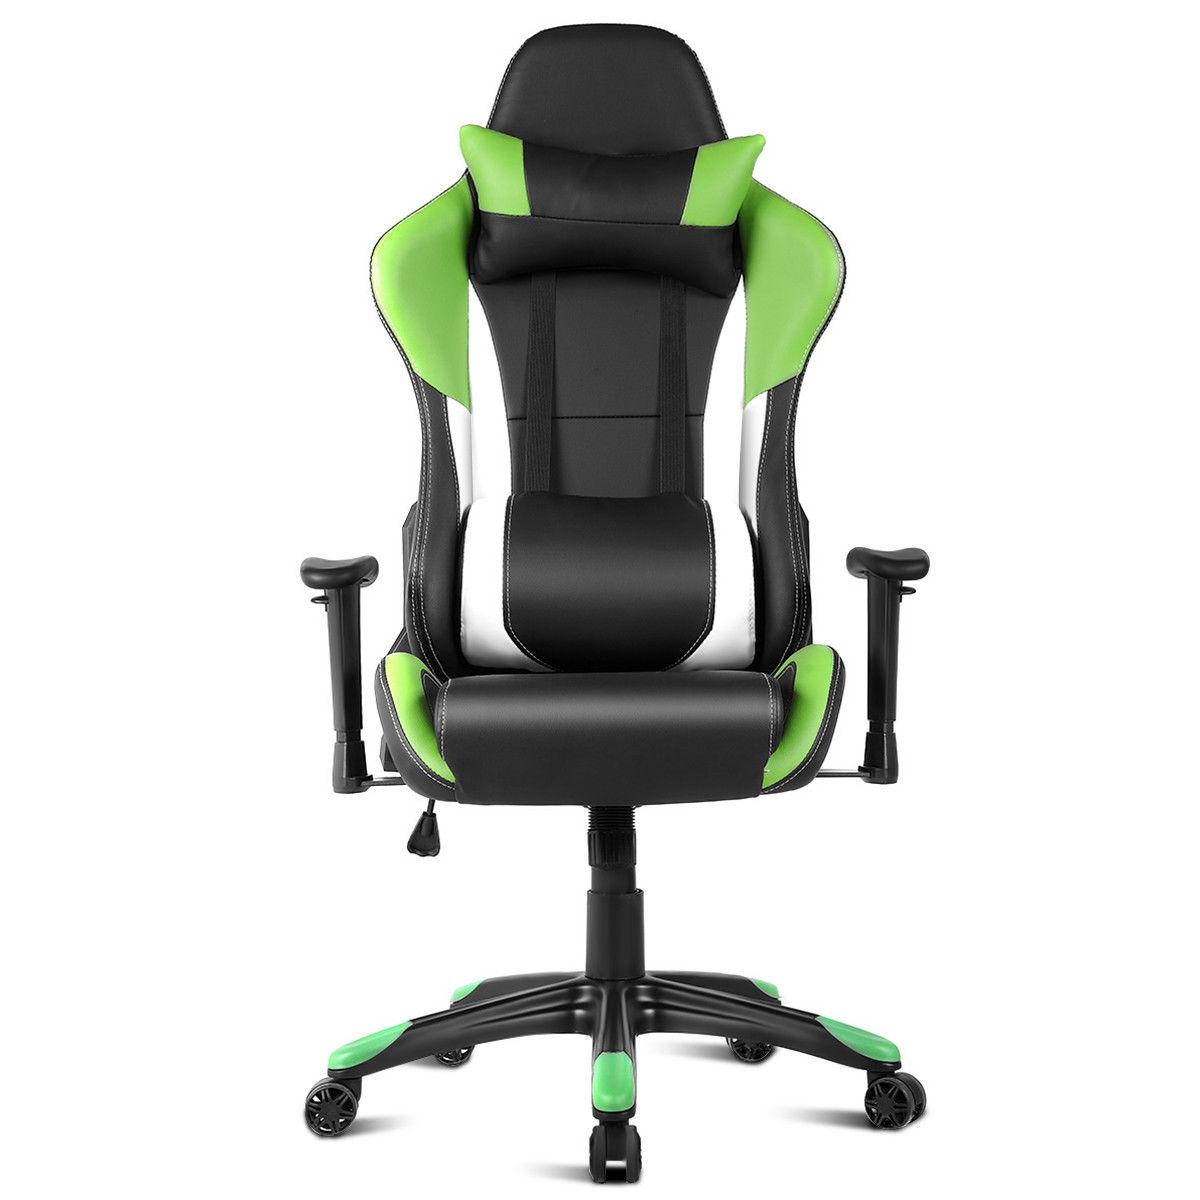 Ergonomic High Back Racing Style Gaming Chair